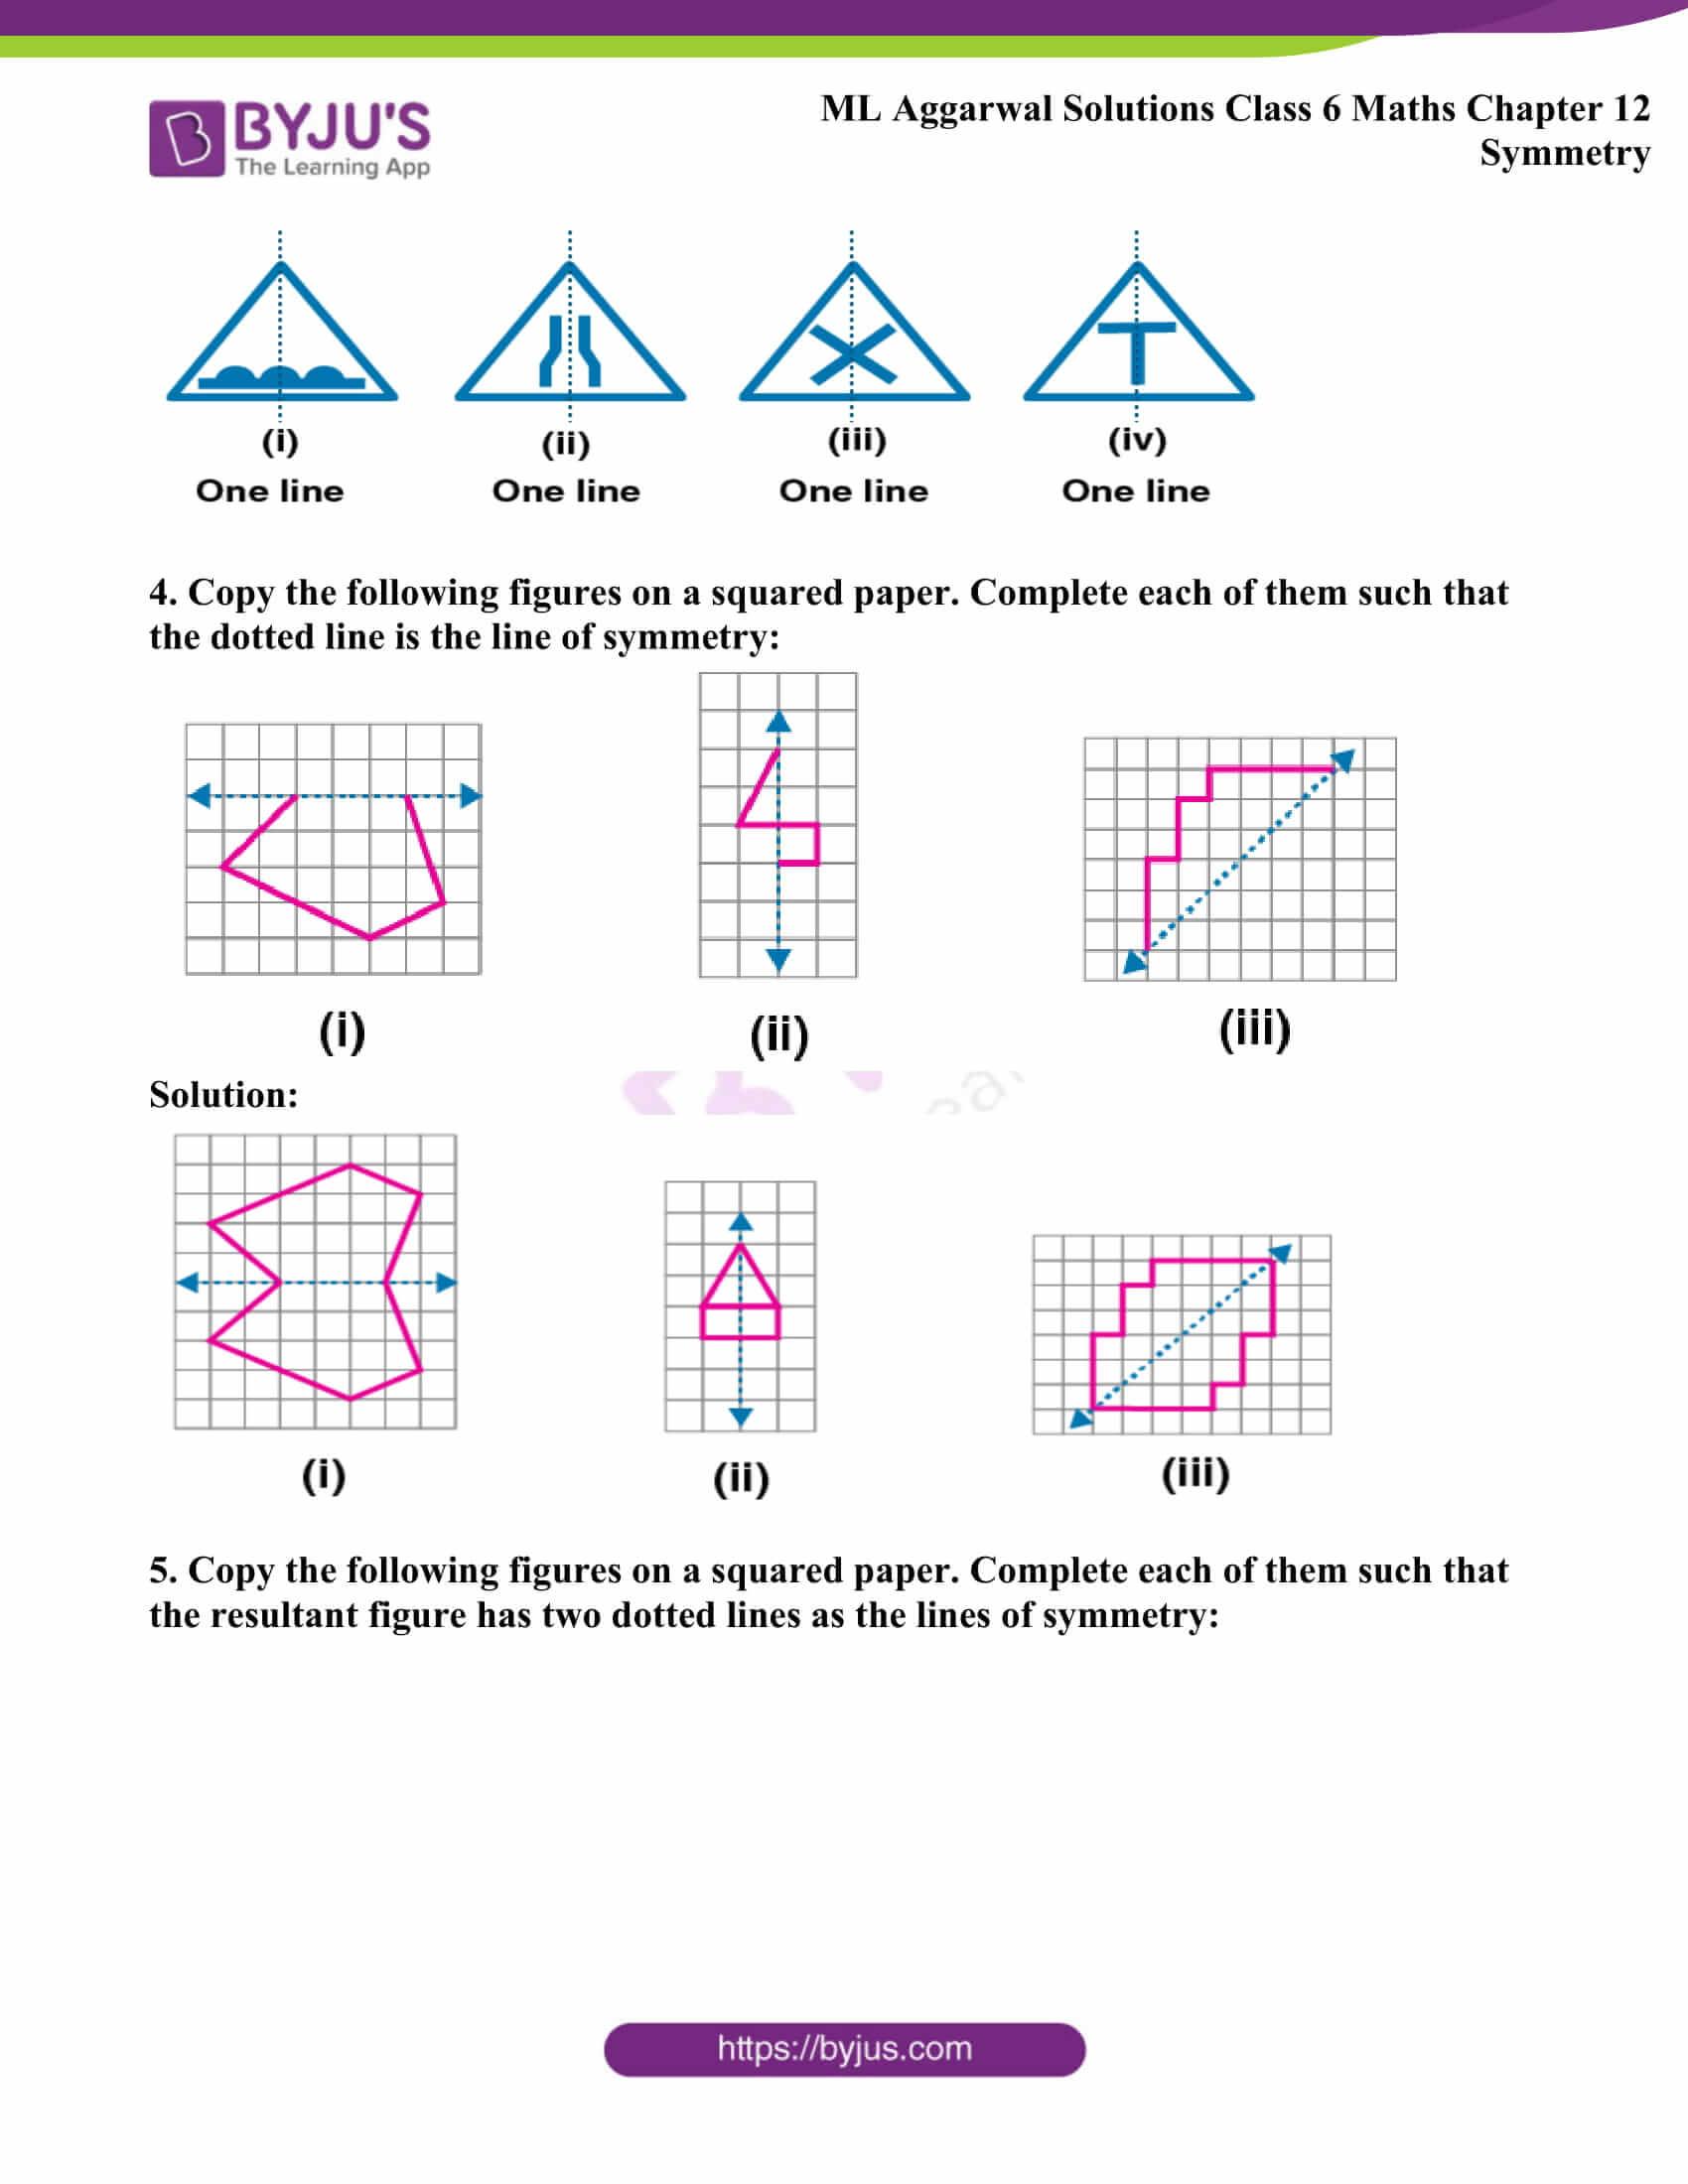 ml aggarwal sol class 6 maths chapter 12 3